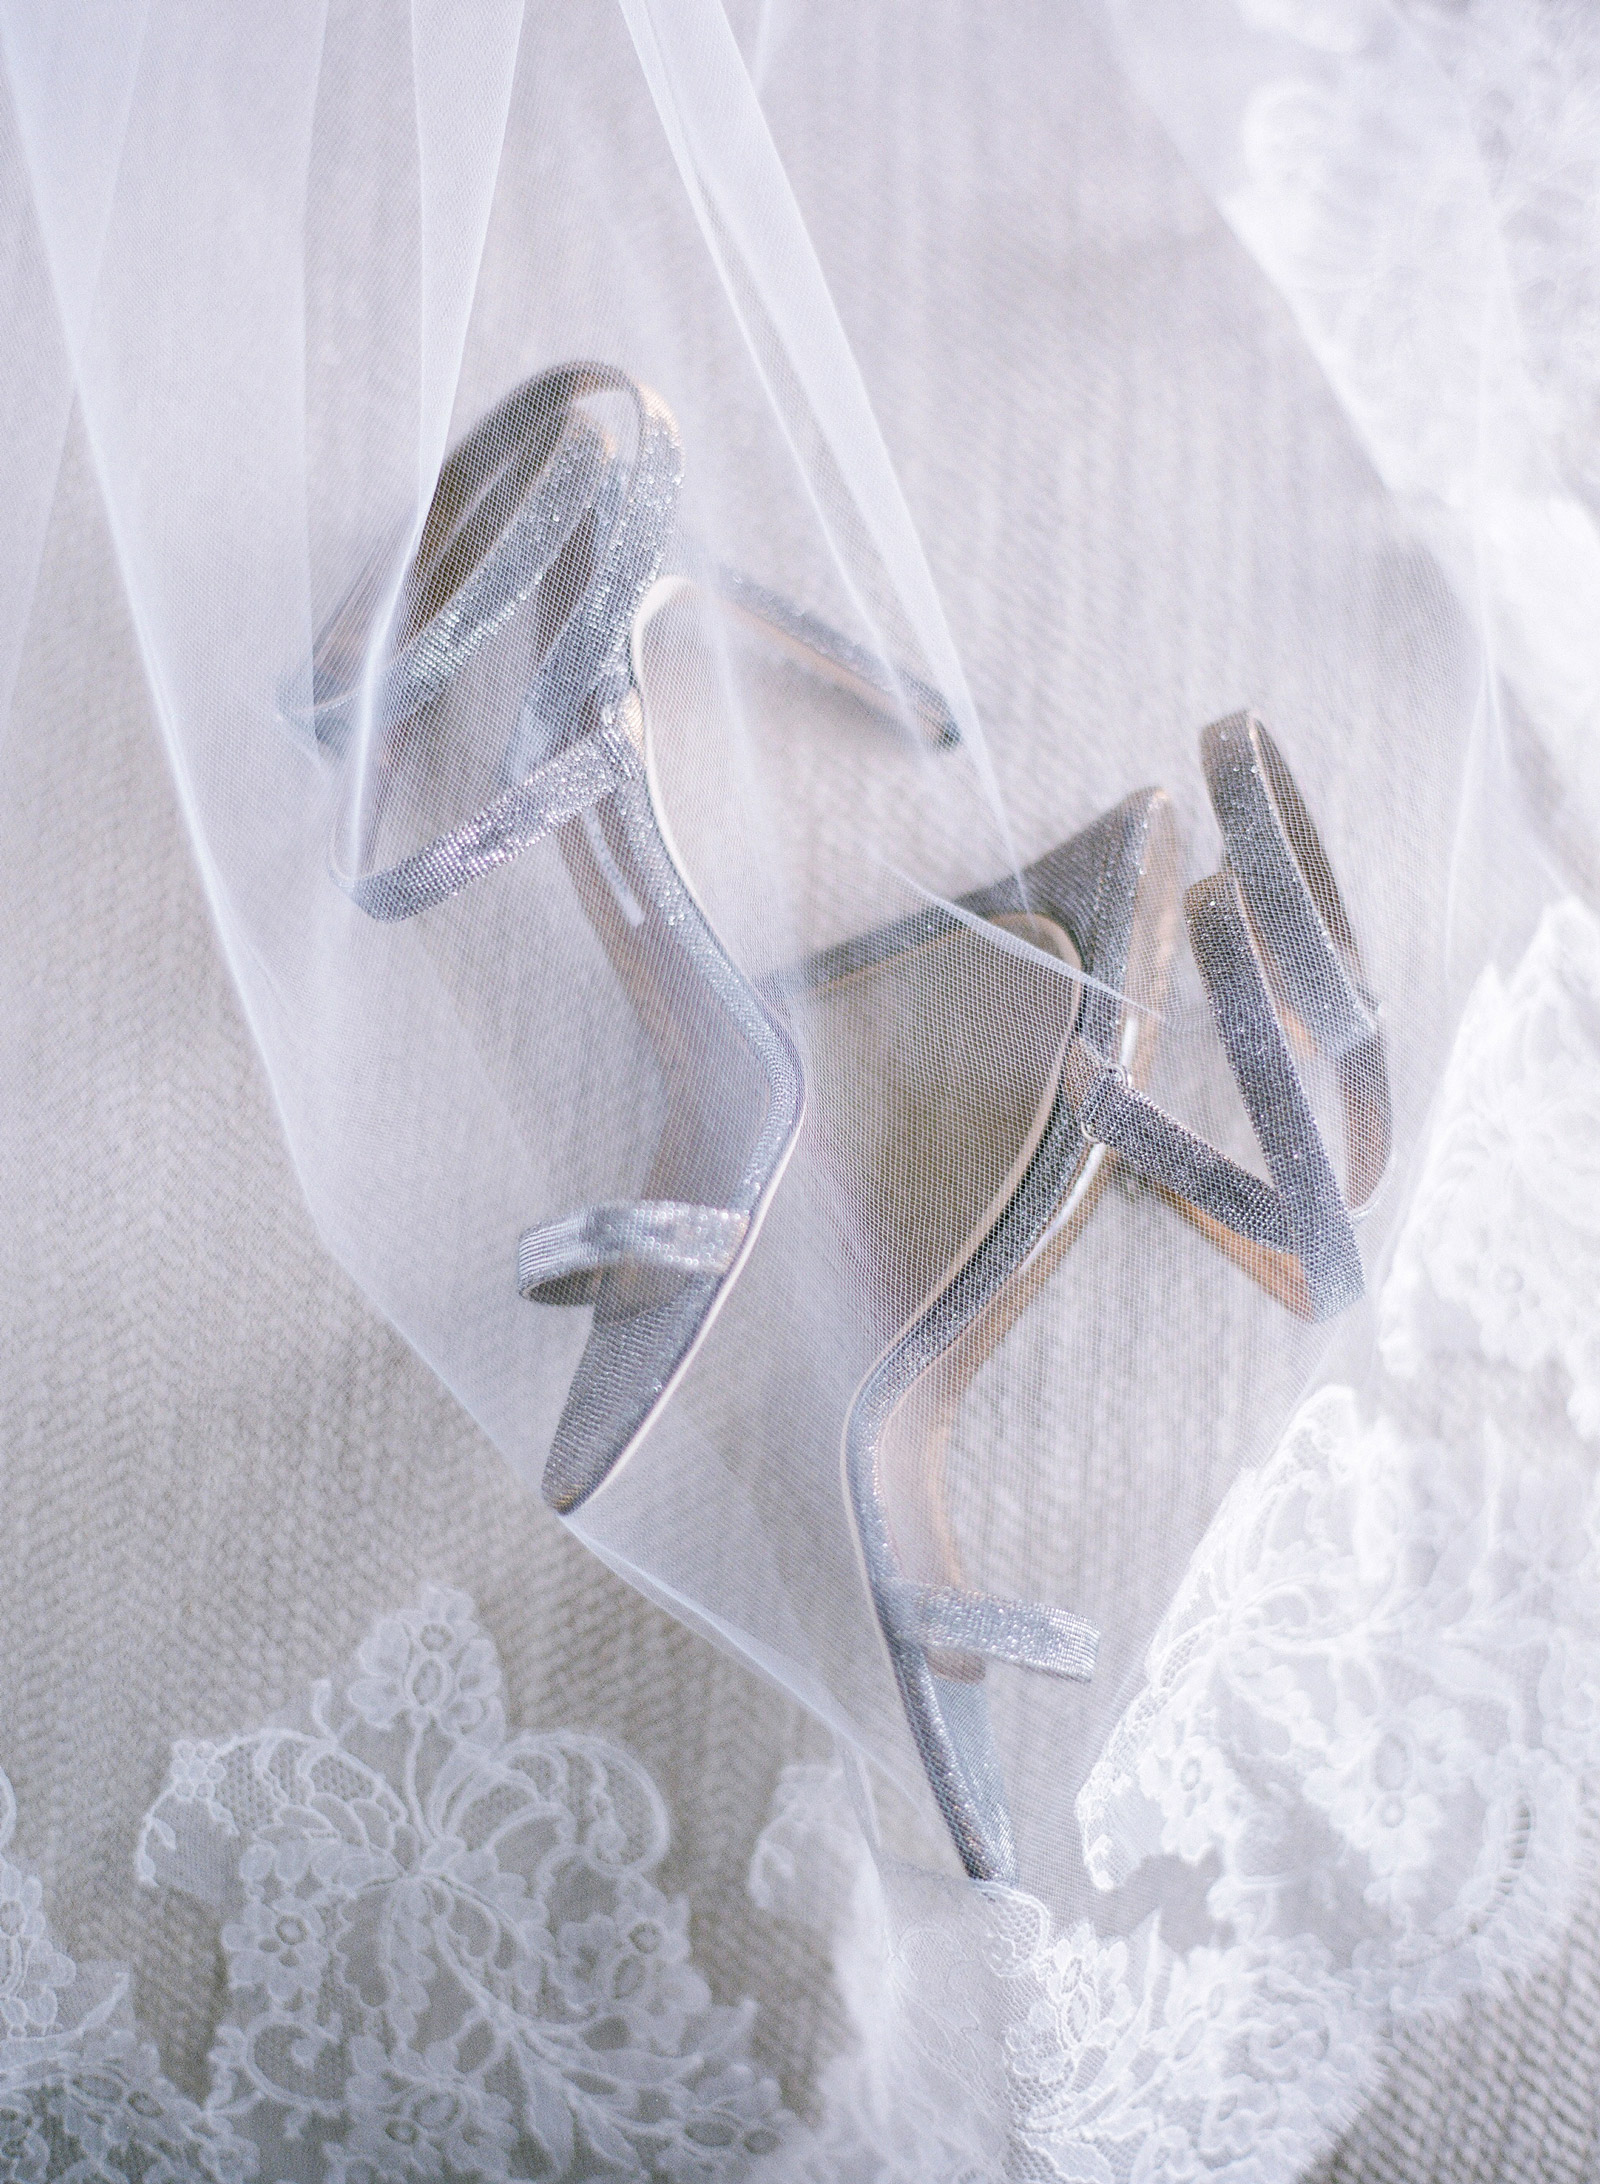 silver wedding shoes beneath veil